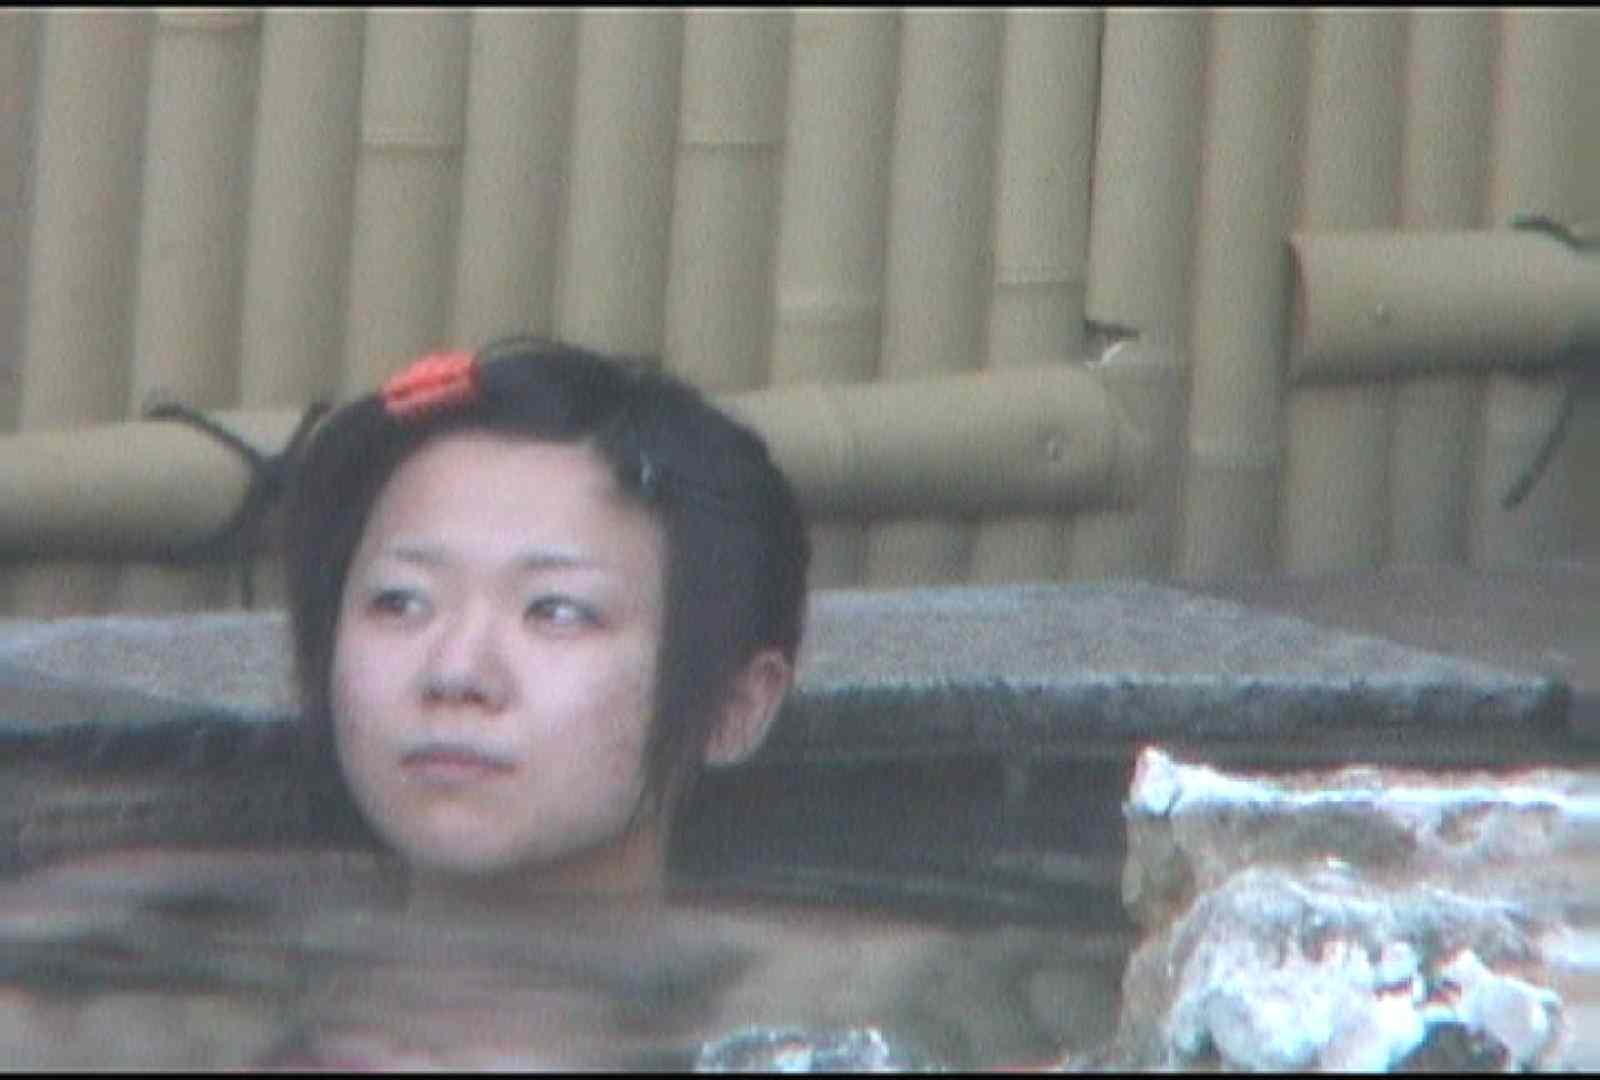 Aquaな露天風呂Vol.175 OLのエロ生活 | 露天風呂  71連発 37